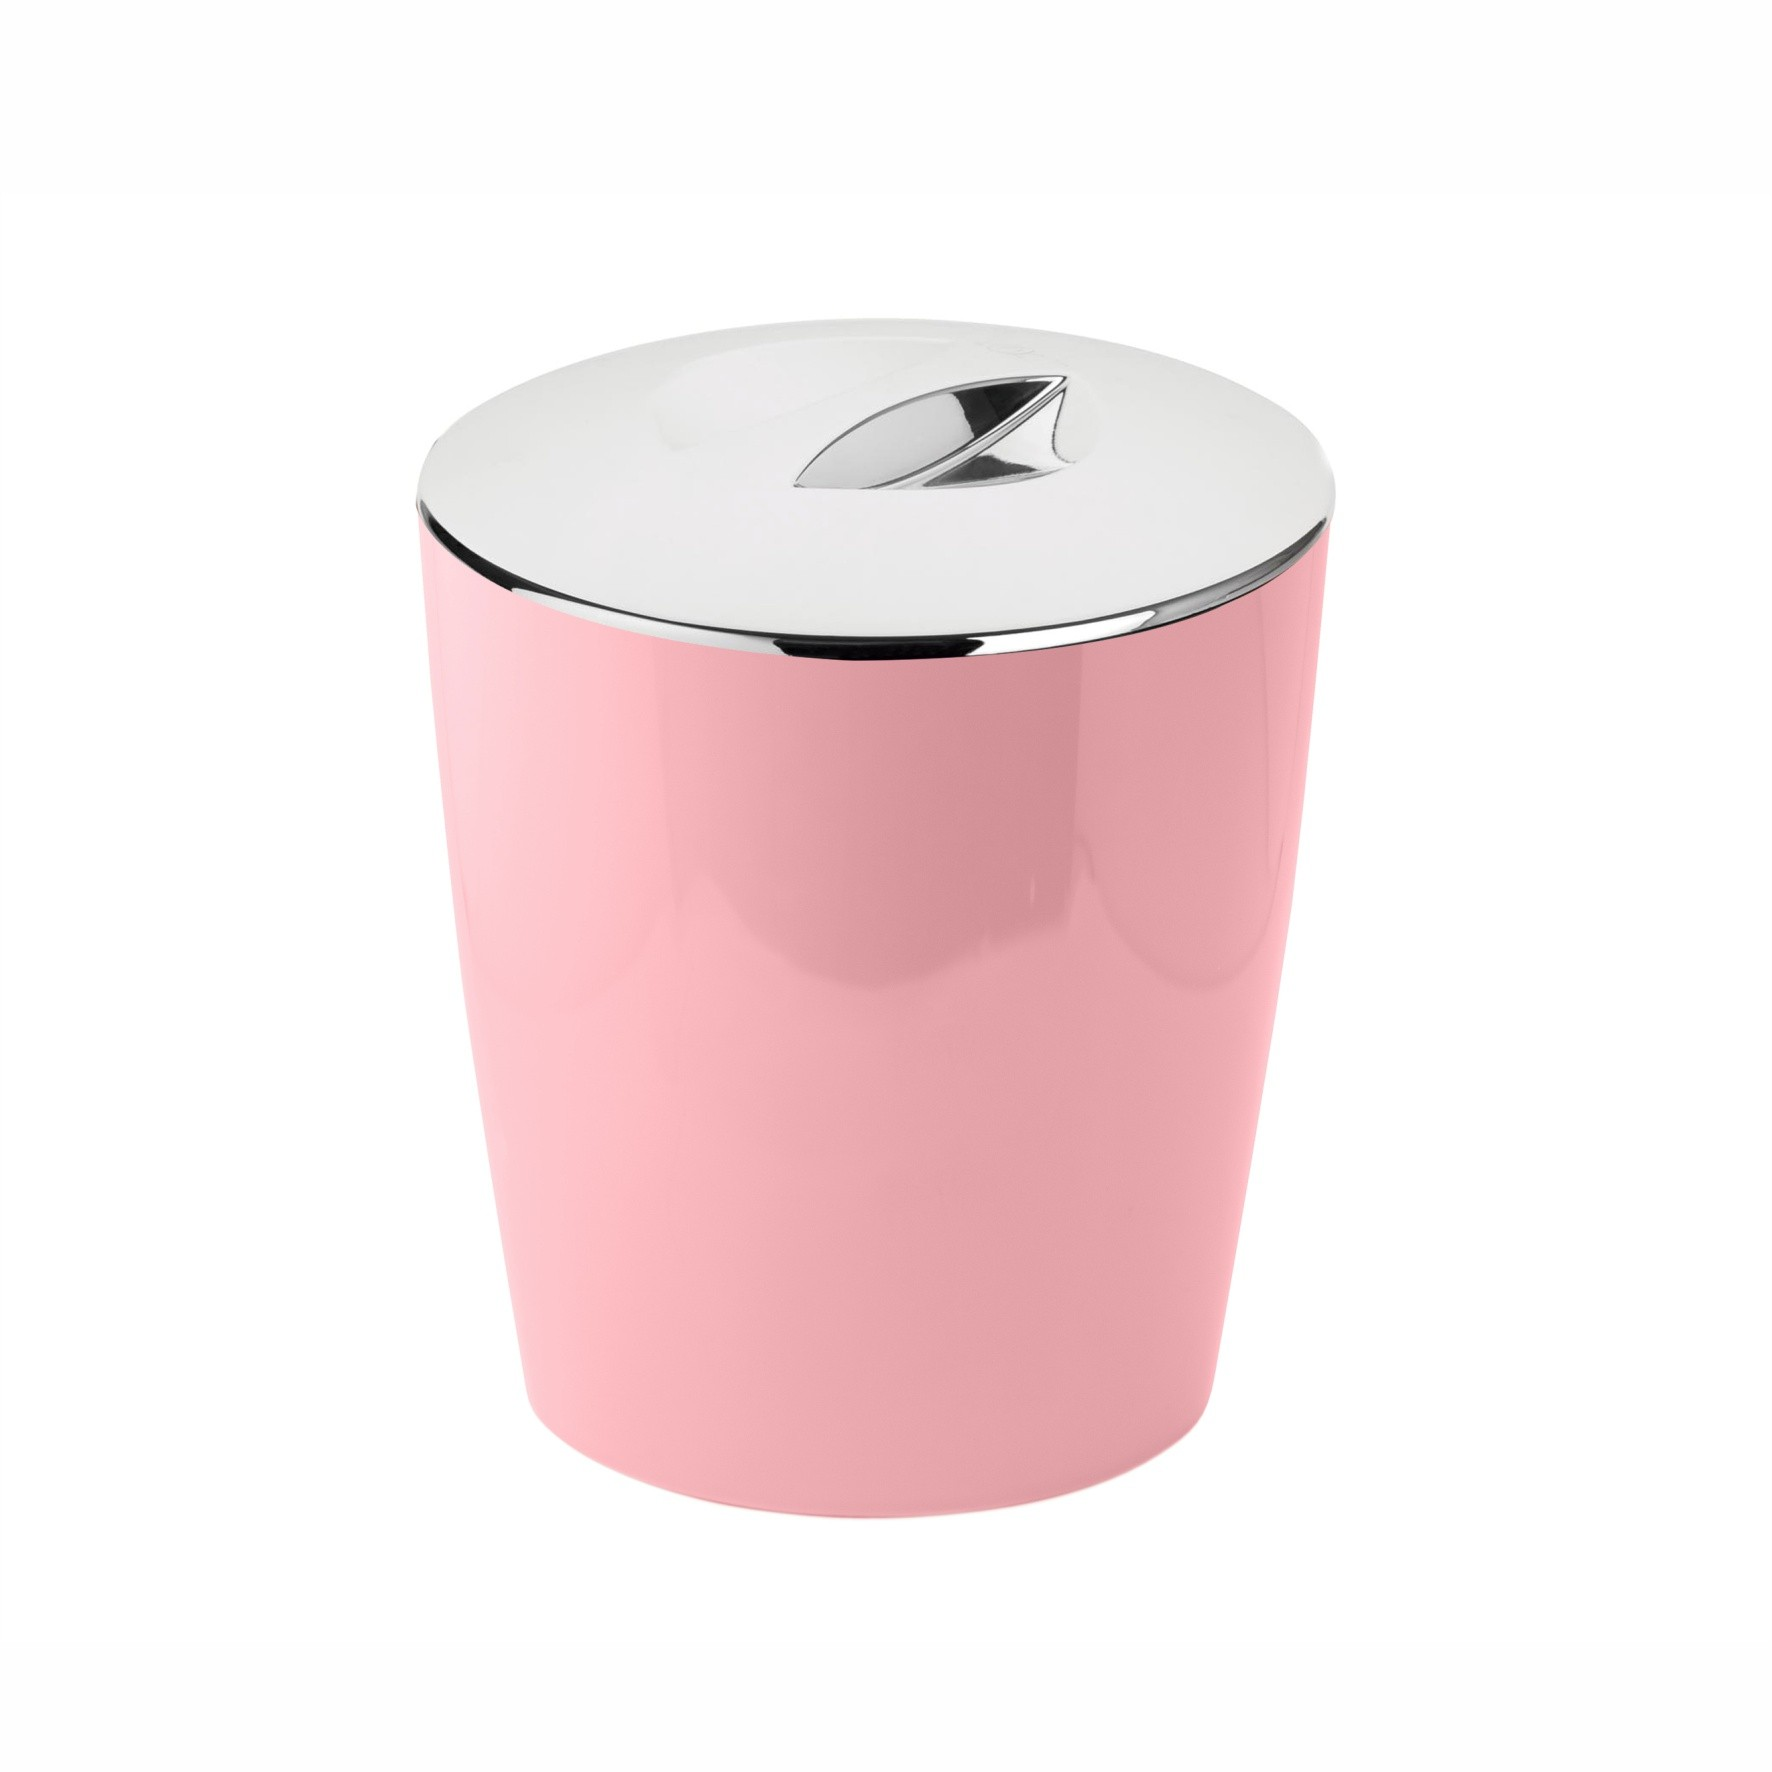 Lixeira 5 lts Cromo Vitra Rosa Quartz - Ou